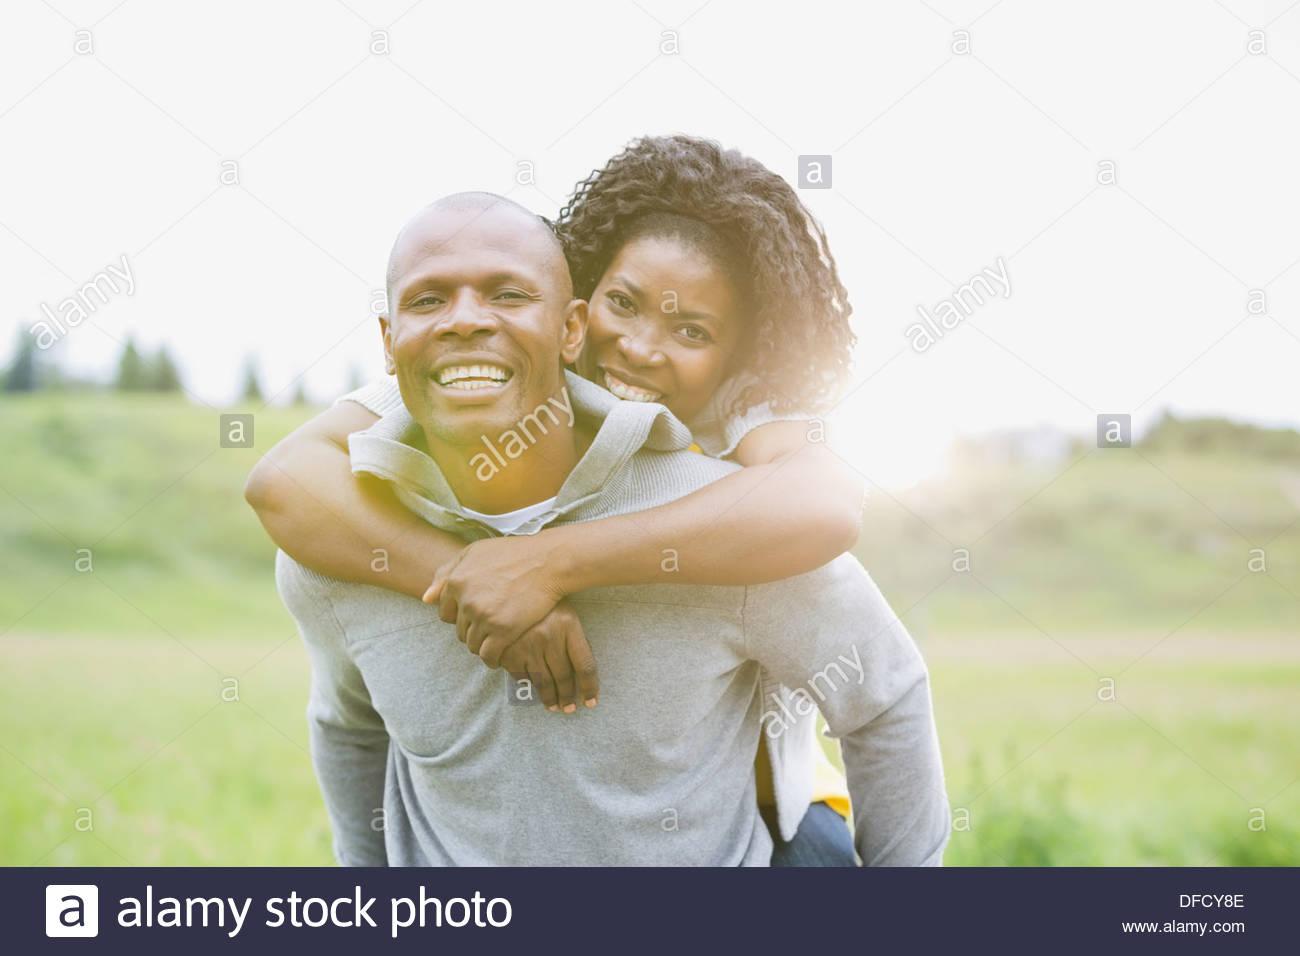 Husband piggybacking wife outdoors - Stock Image